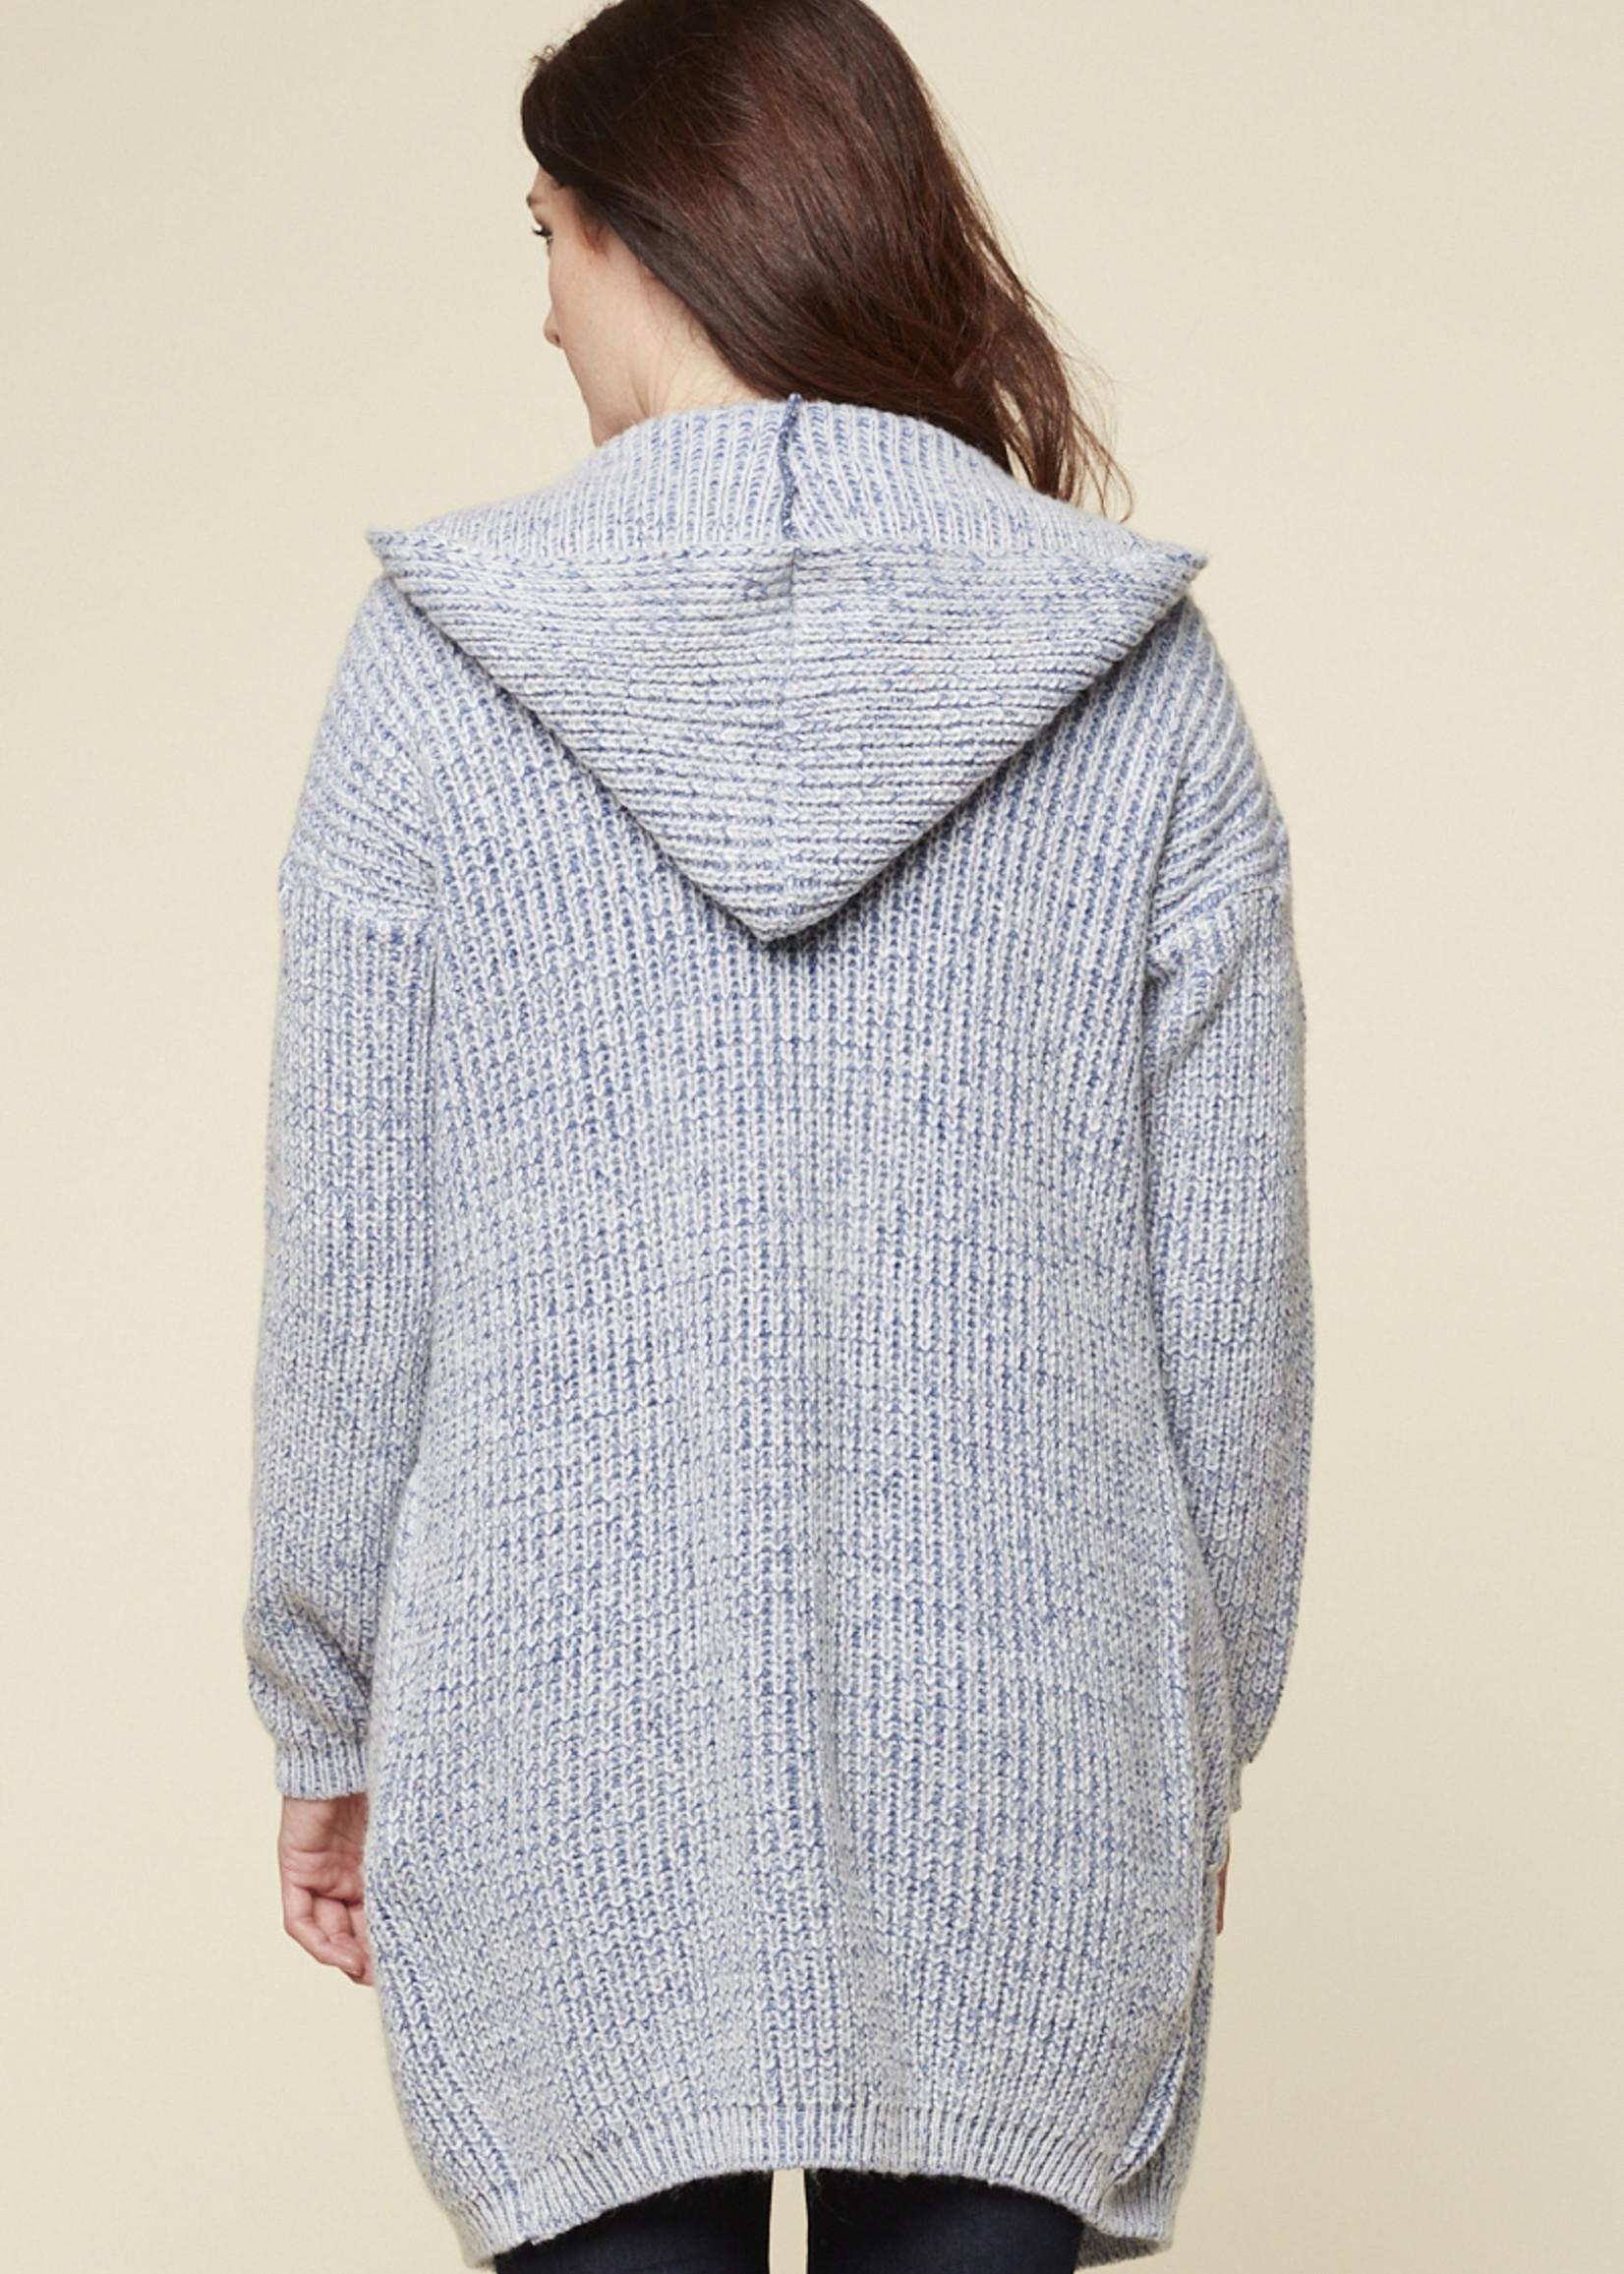 Parkhurst Parkhurst Long Robe Cardigan with Hood